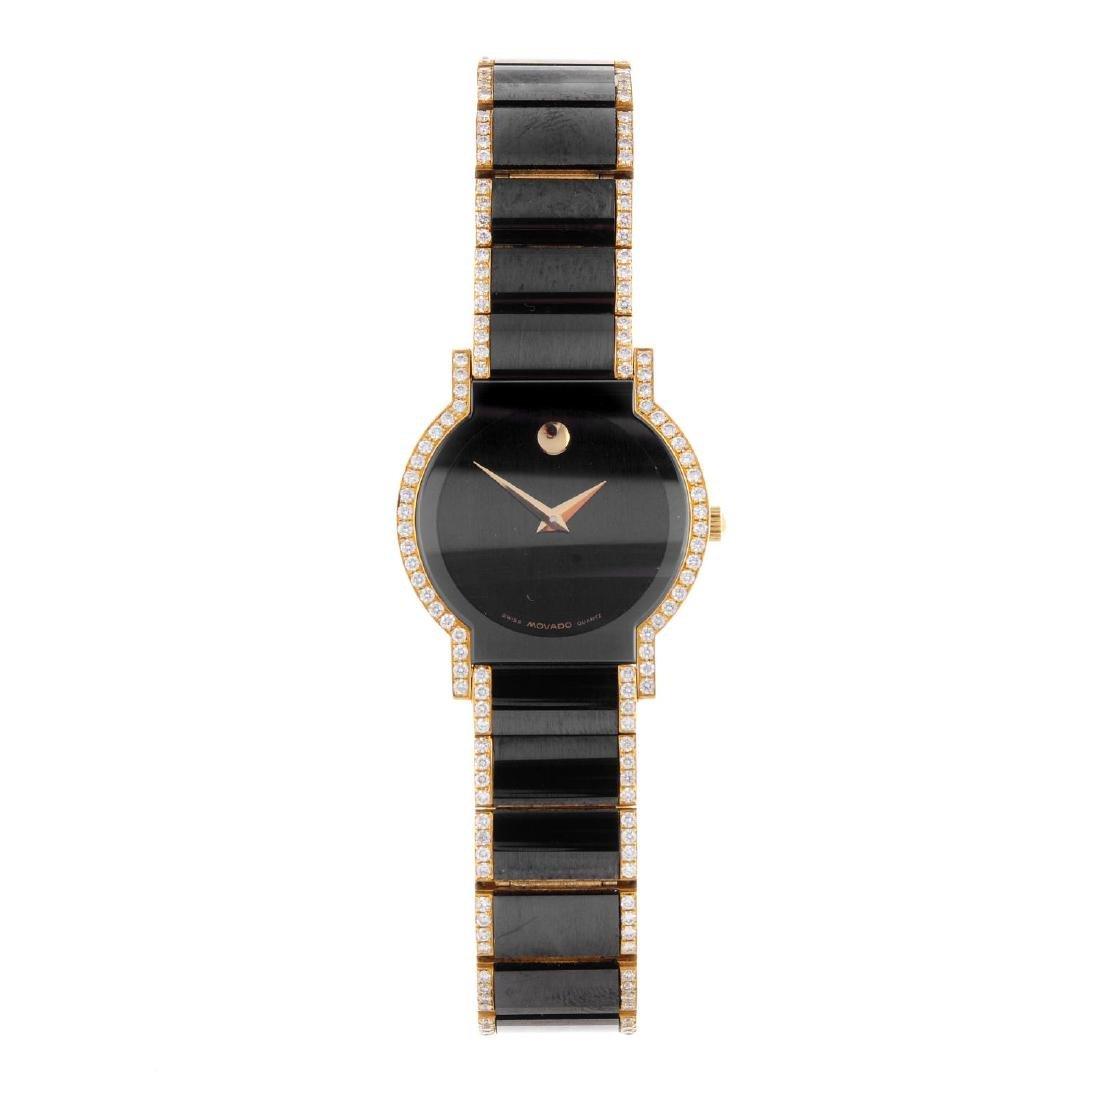 MOVADO - a lady's Museum bracelet watch. 18ct yellow